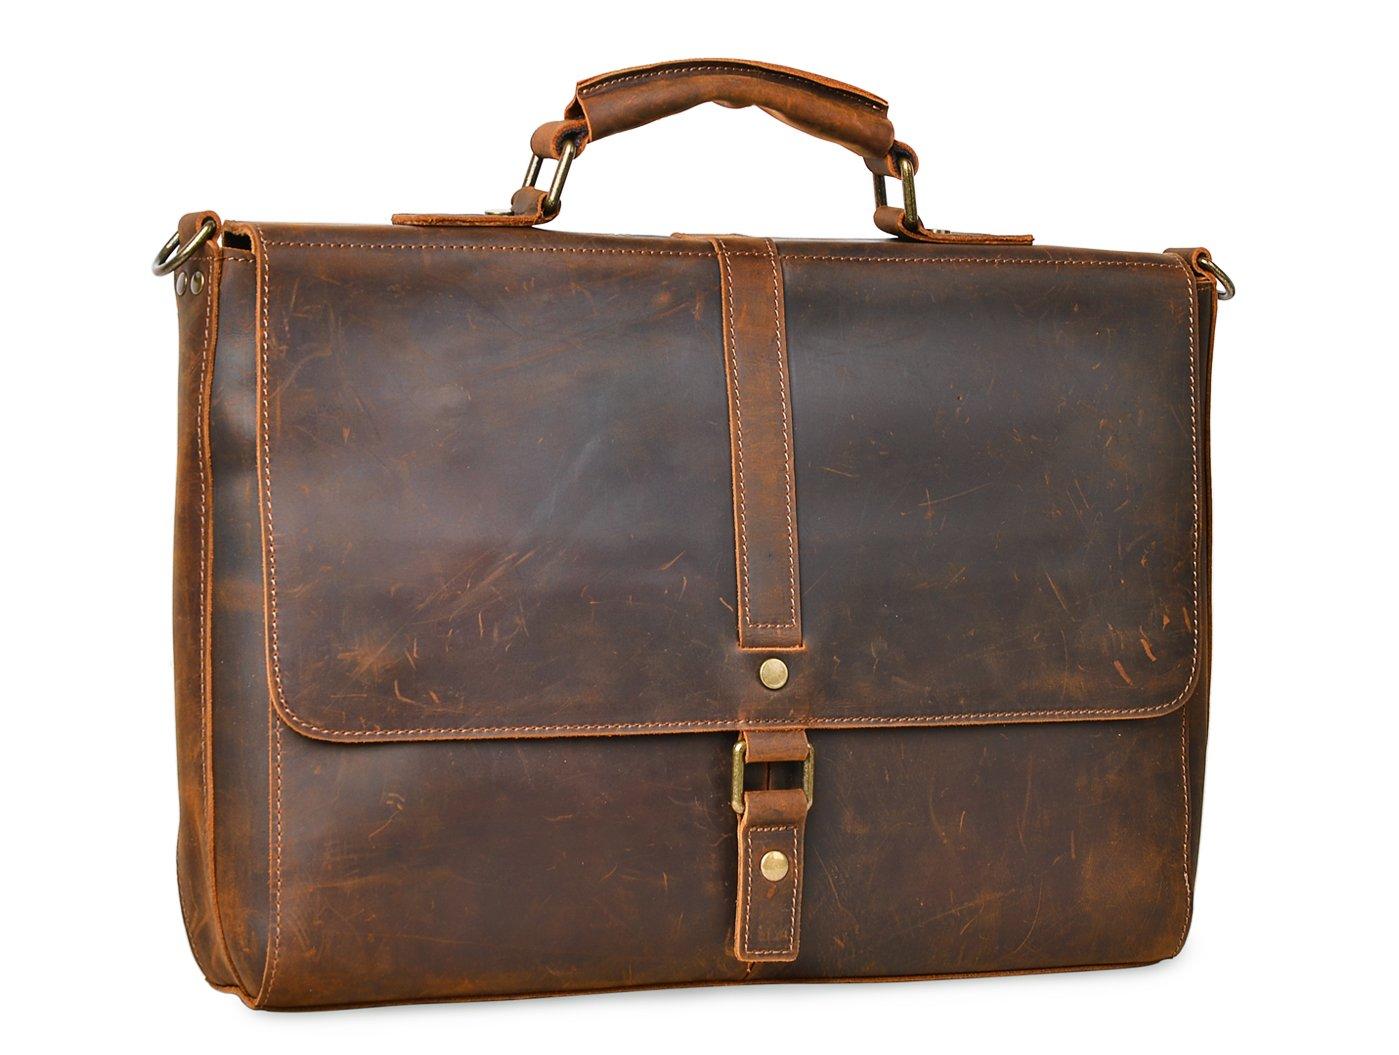 ALTOSY Vintage Genuine Leather Business Laptop Briefcase Office Shoulder Bag 8127 (Brown) by Altosy (Image #2)